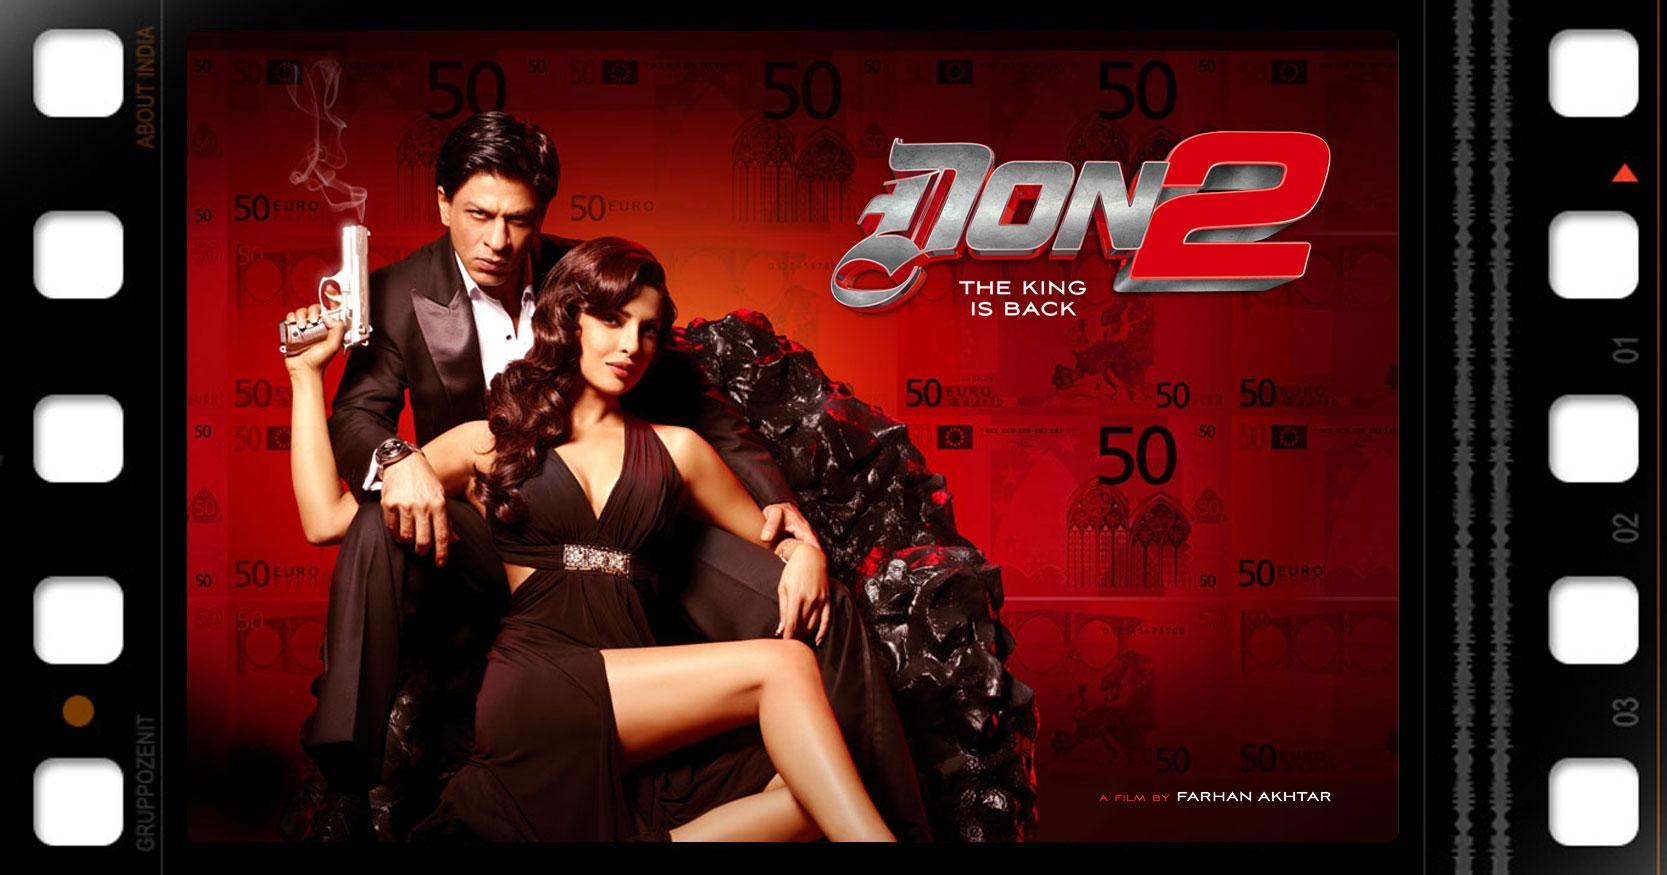 poster di Don 2 con Shah Rulkh Khan e Priyanka Chopra